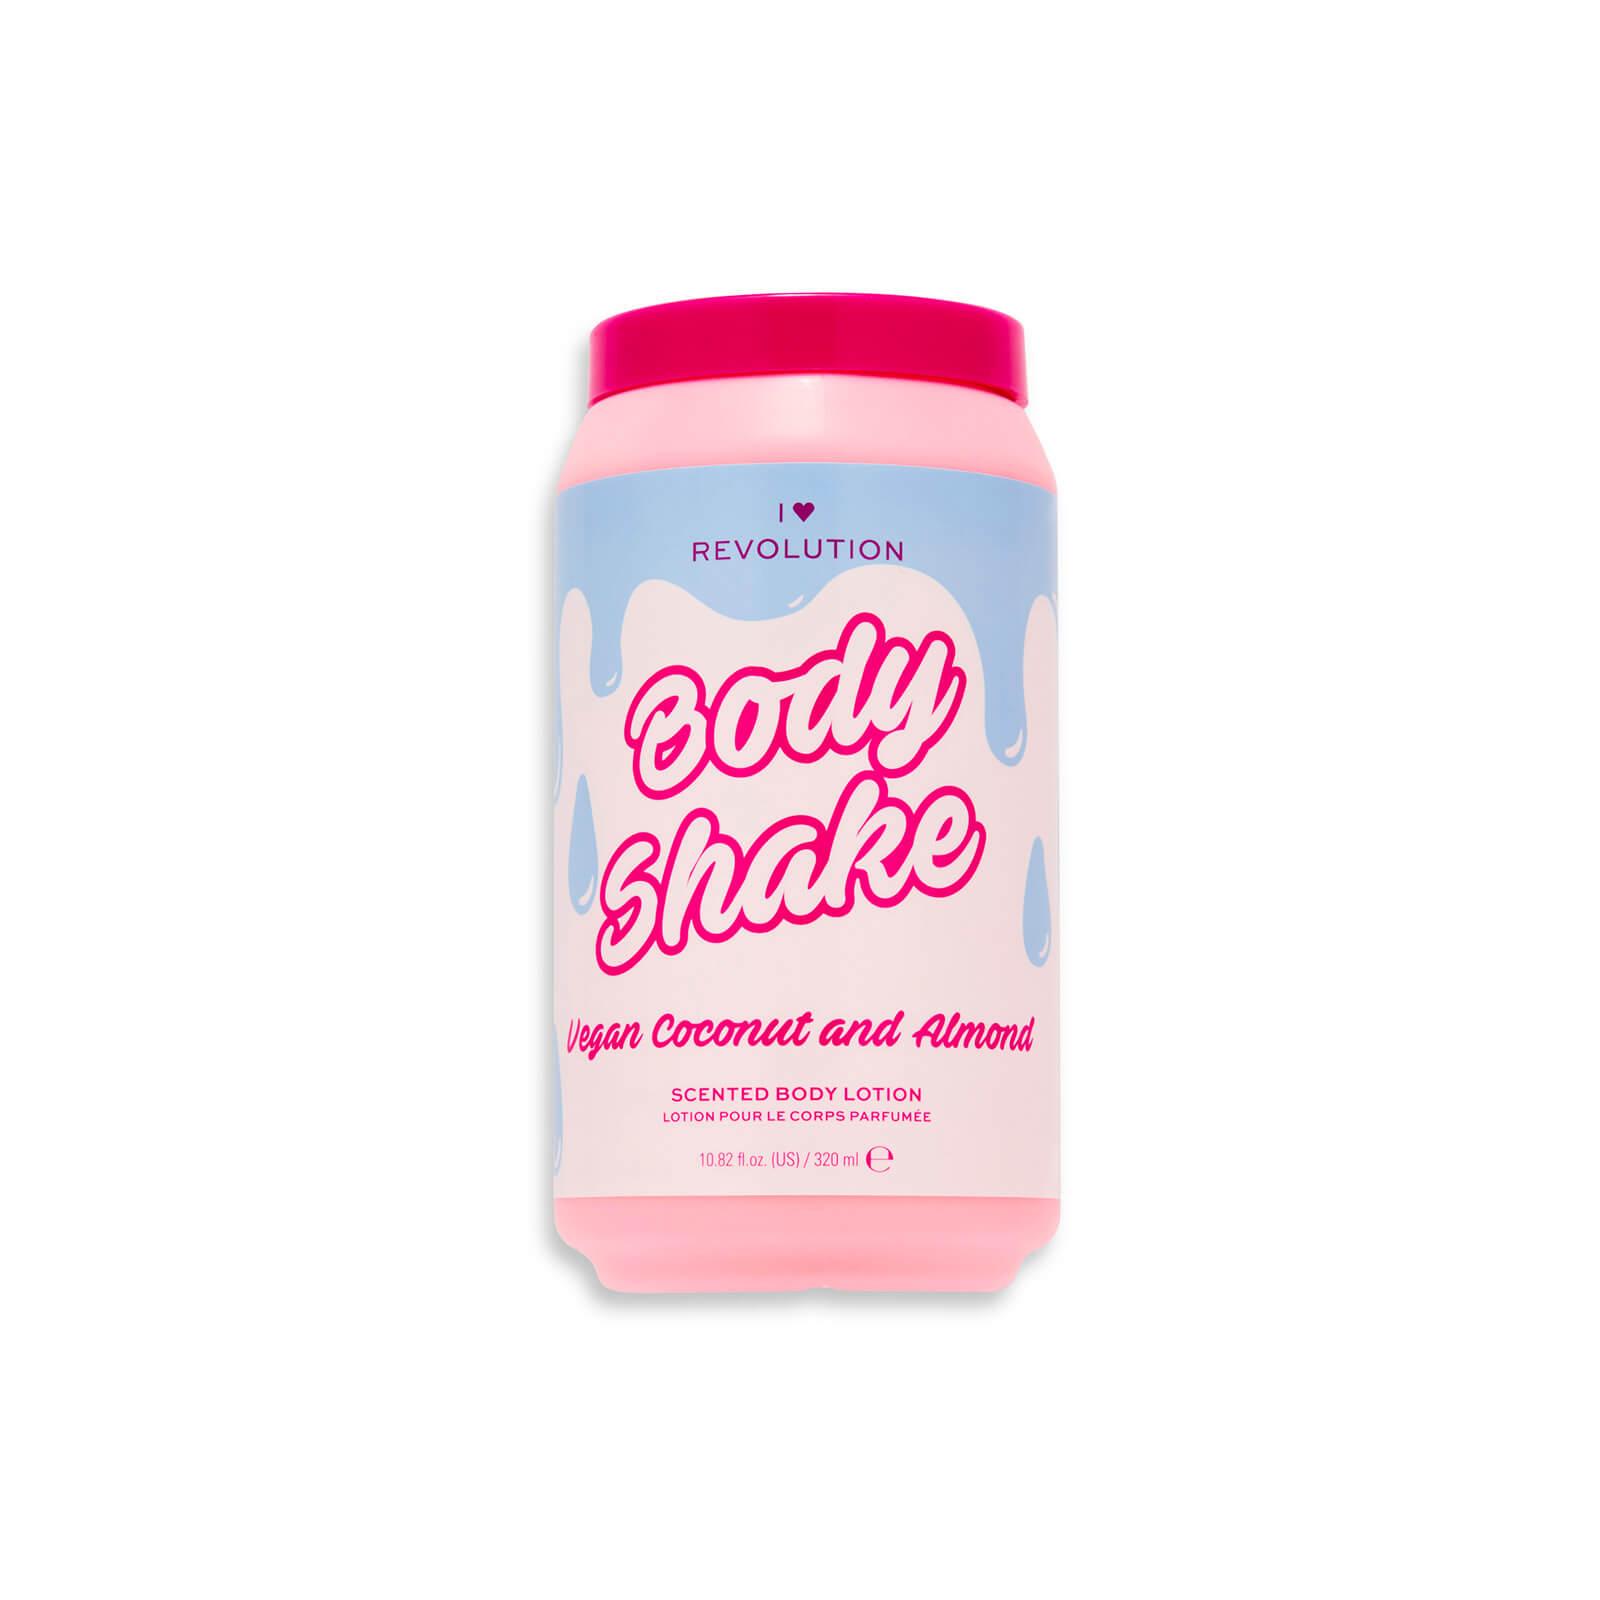 Купить I Heart Revolution Tasty Shower Milkshake Vegan Coconut and Almond